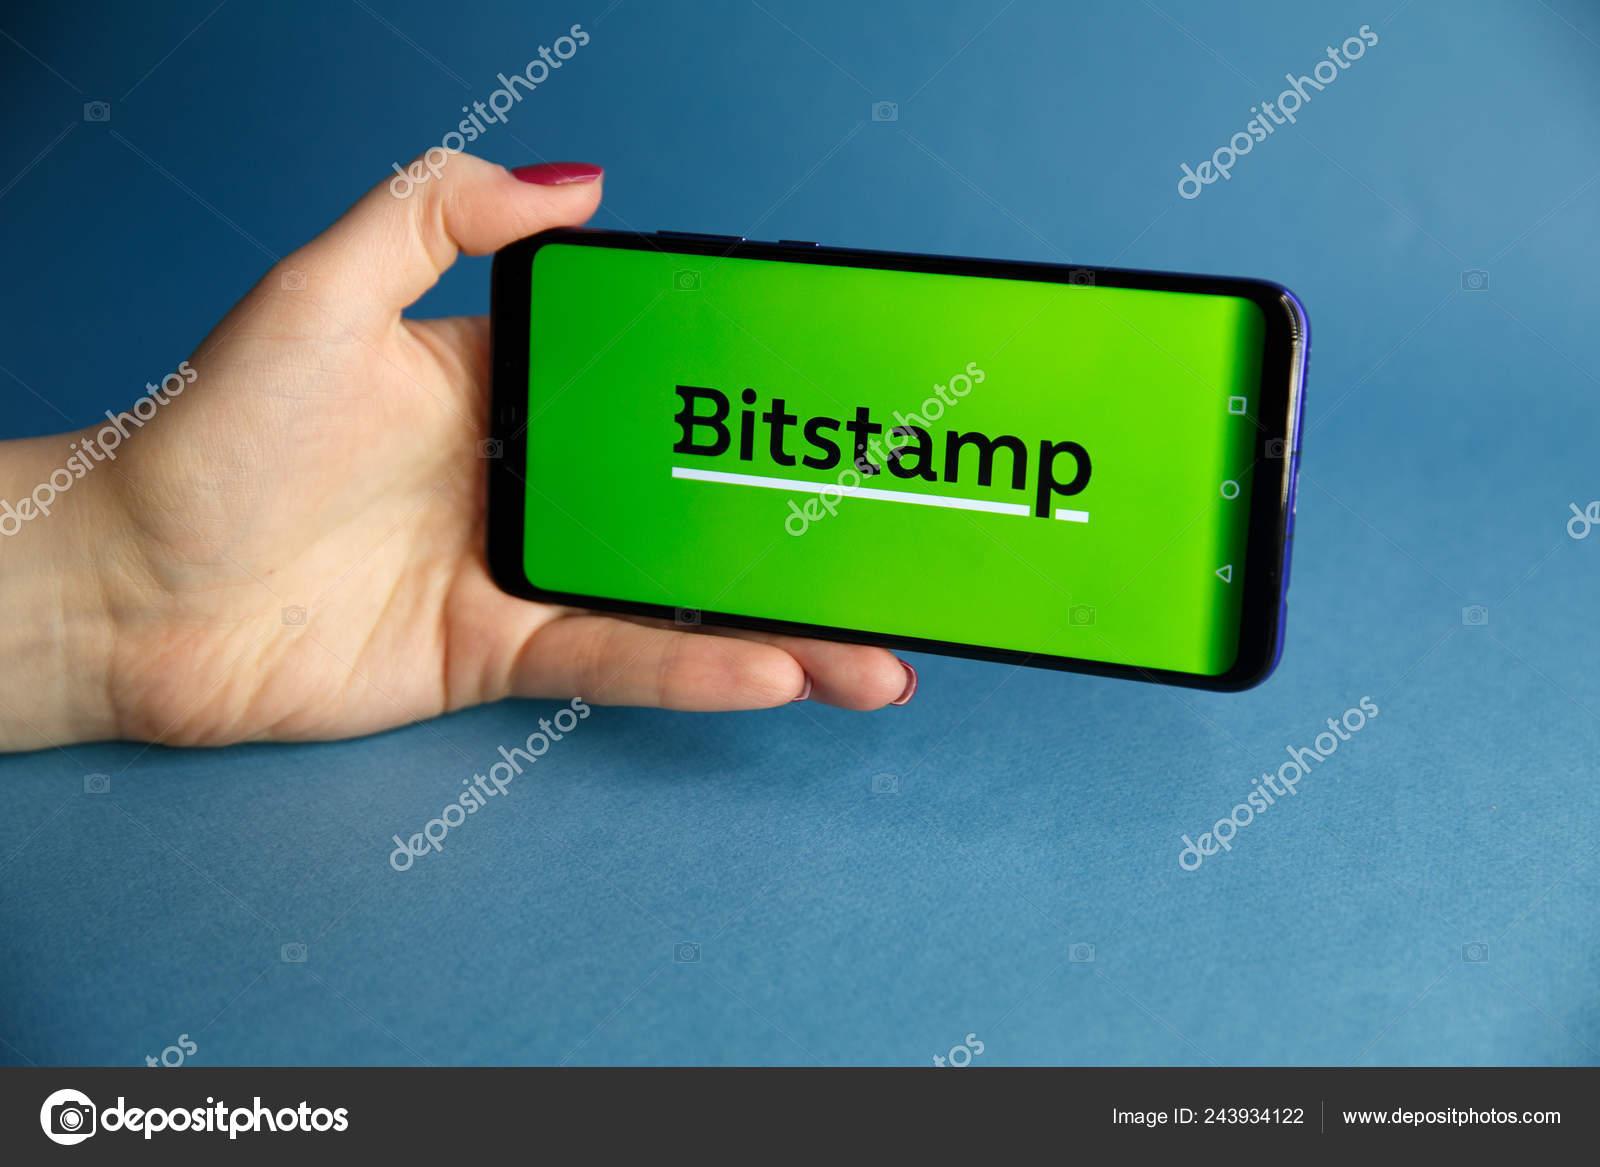 Tula, Russia - JANUARY 29, 2019: Bitstamp cryptocurrency exchange